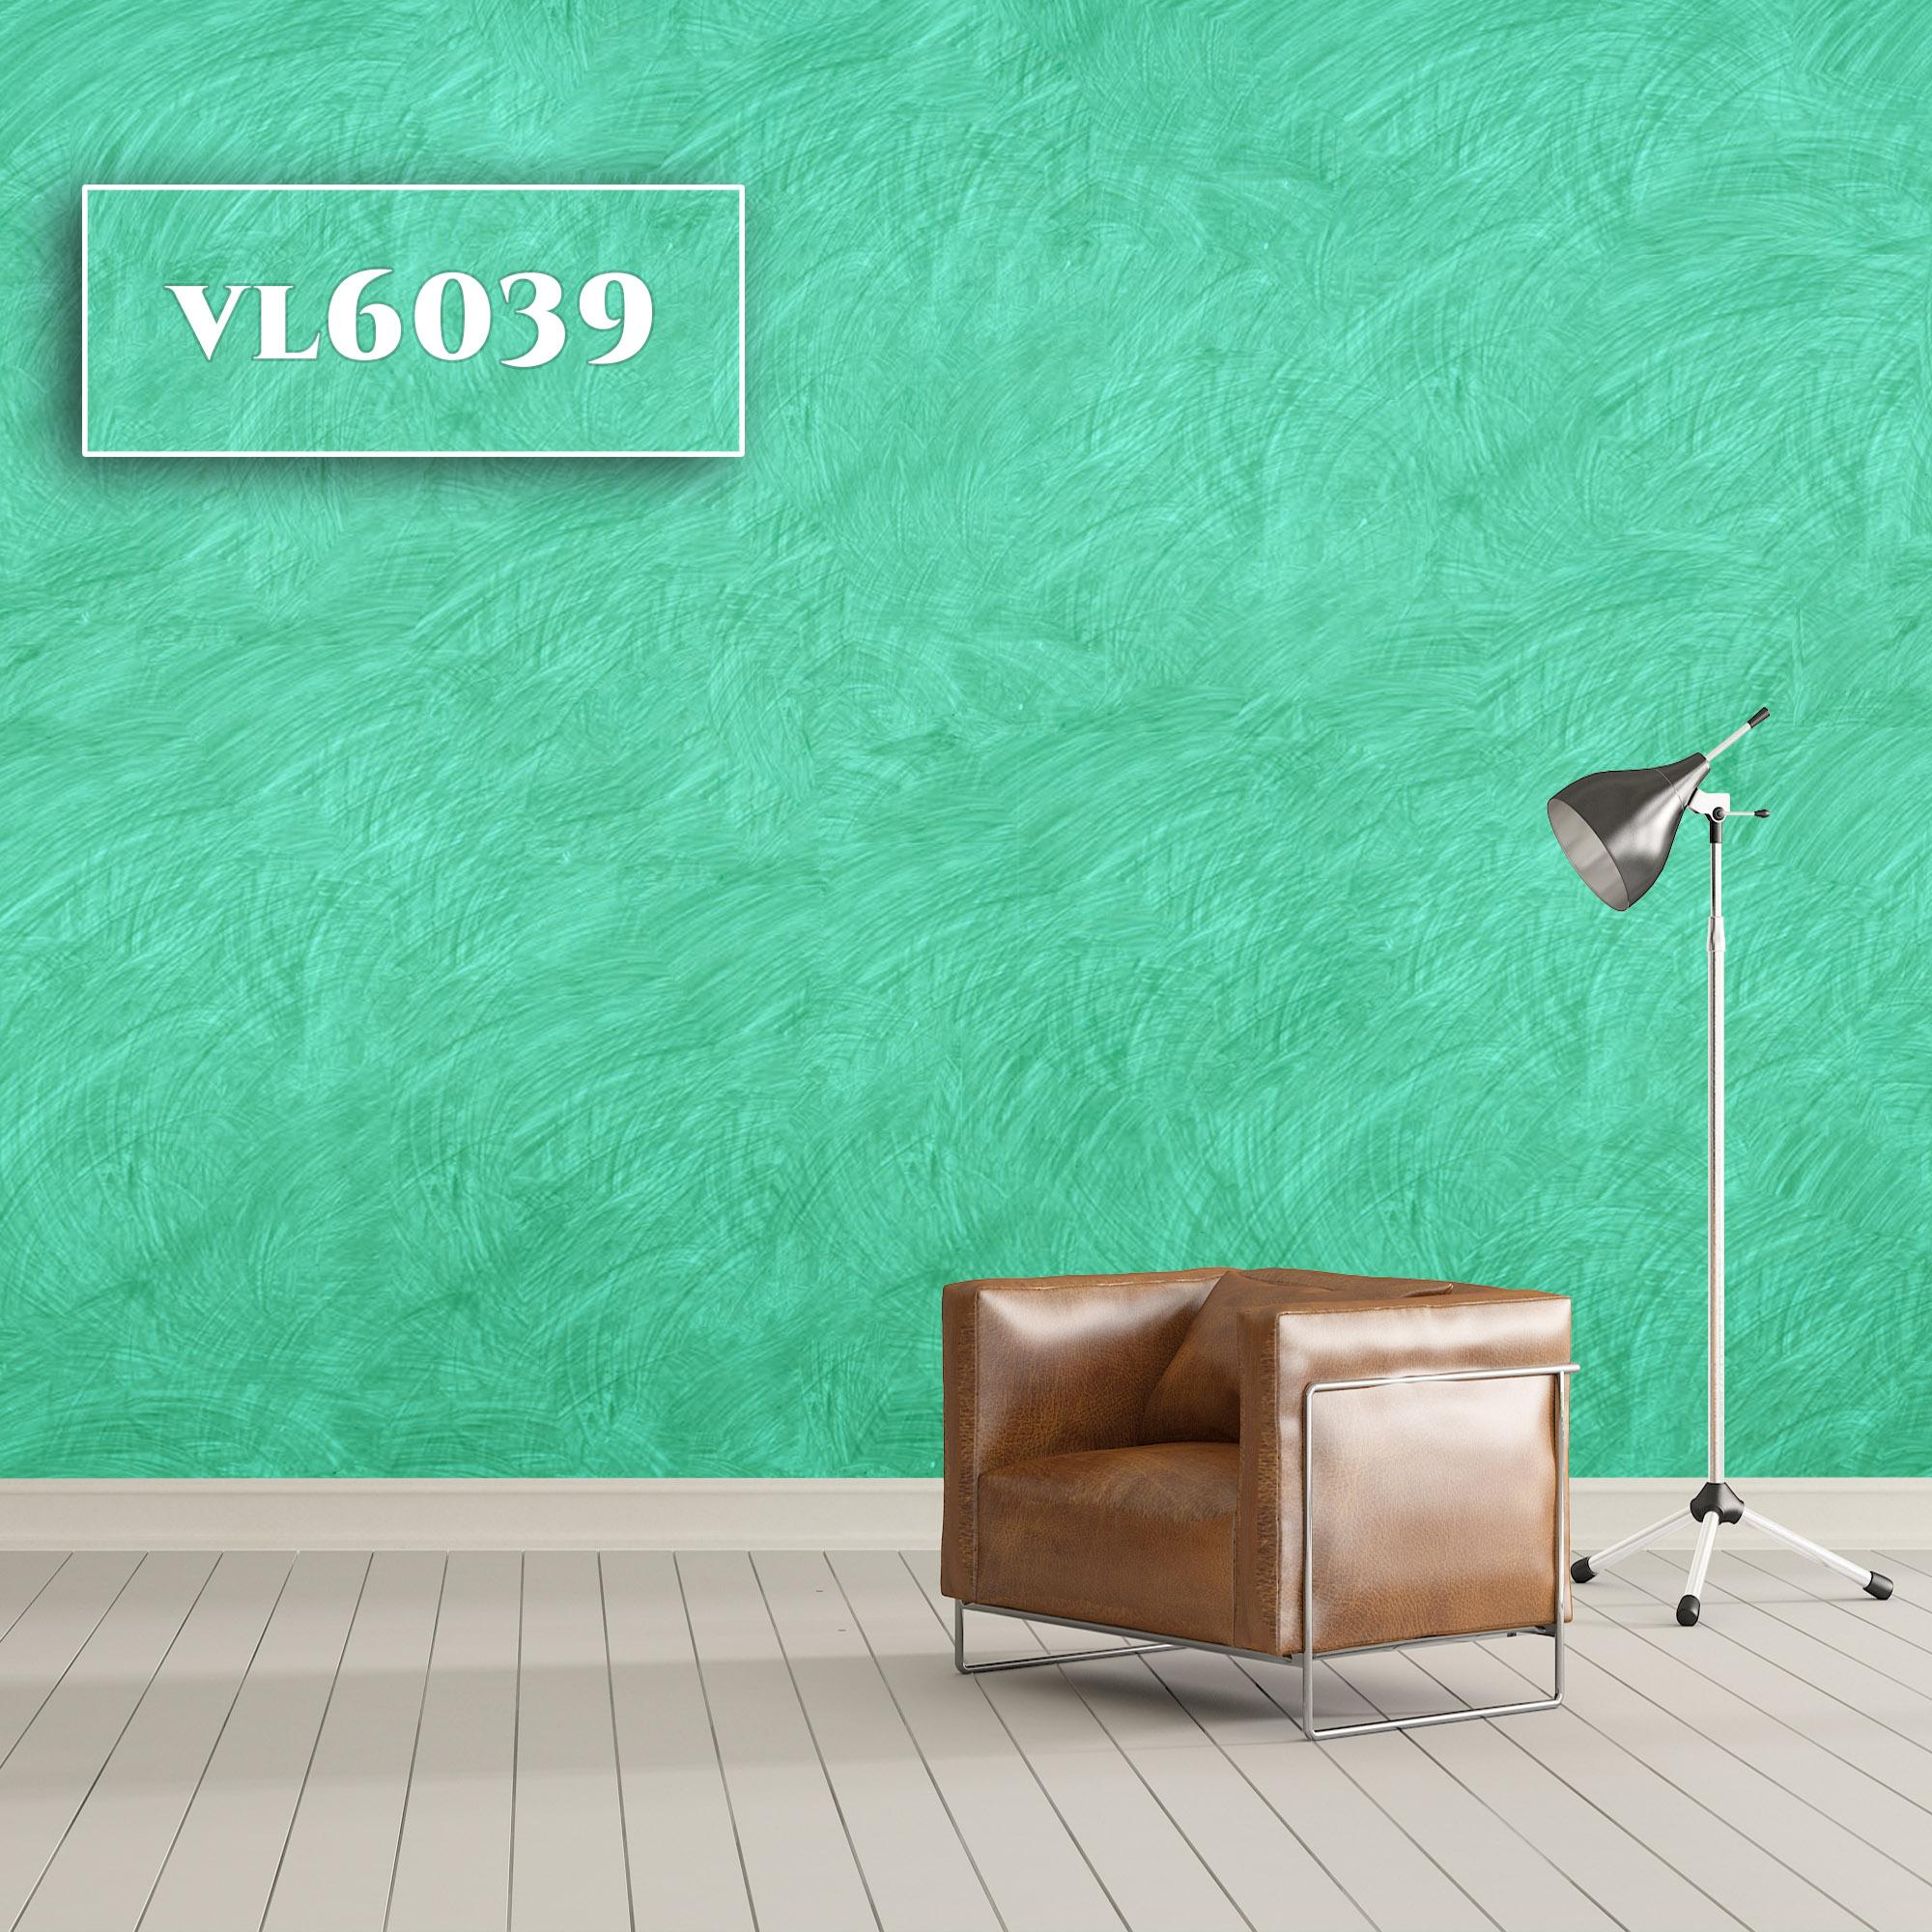 VL6039